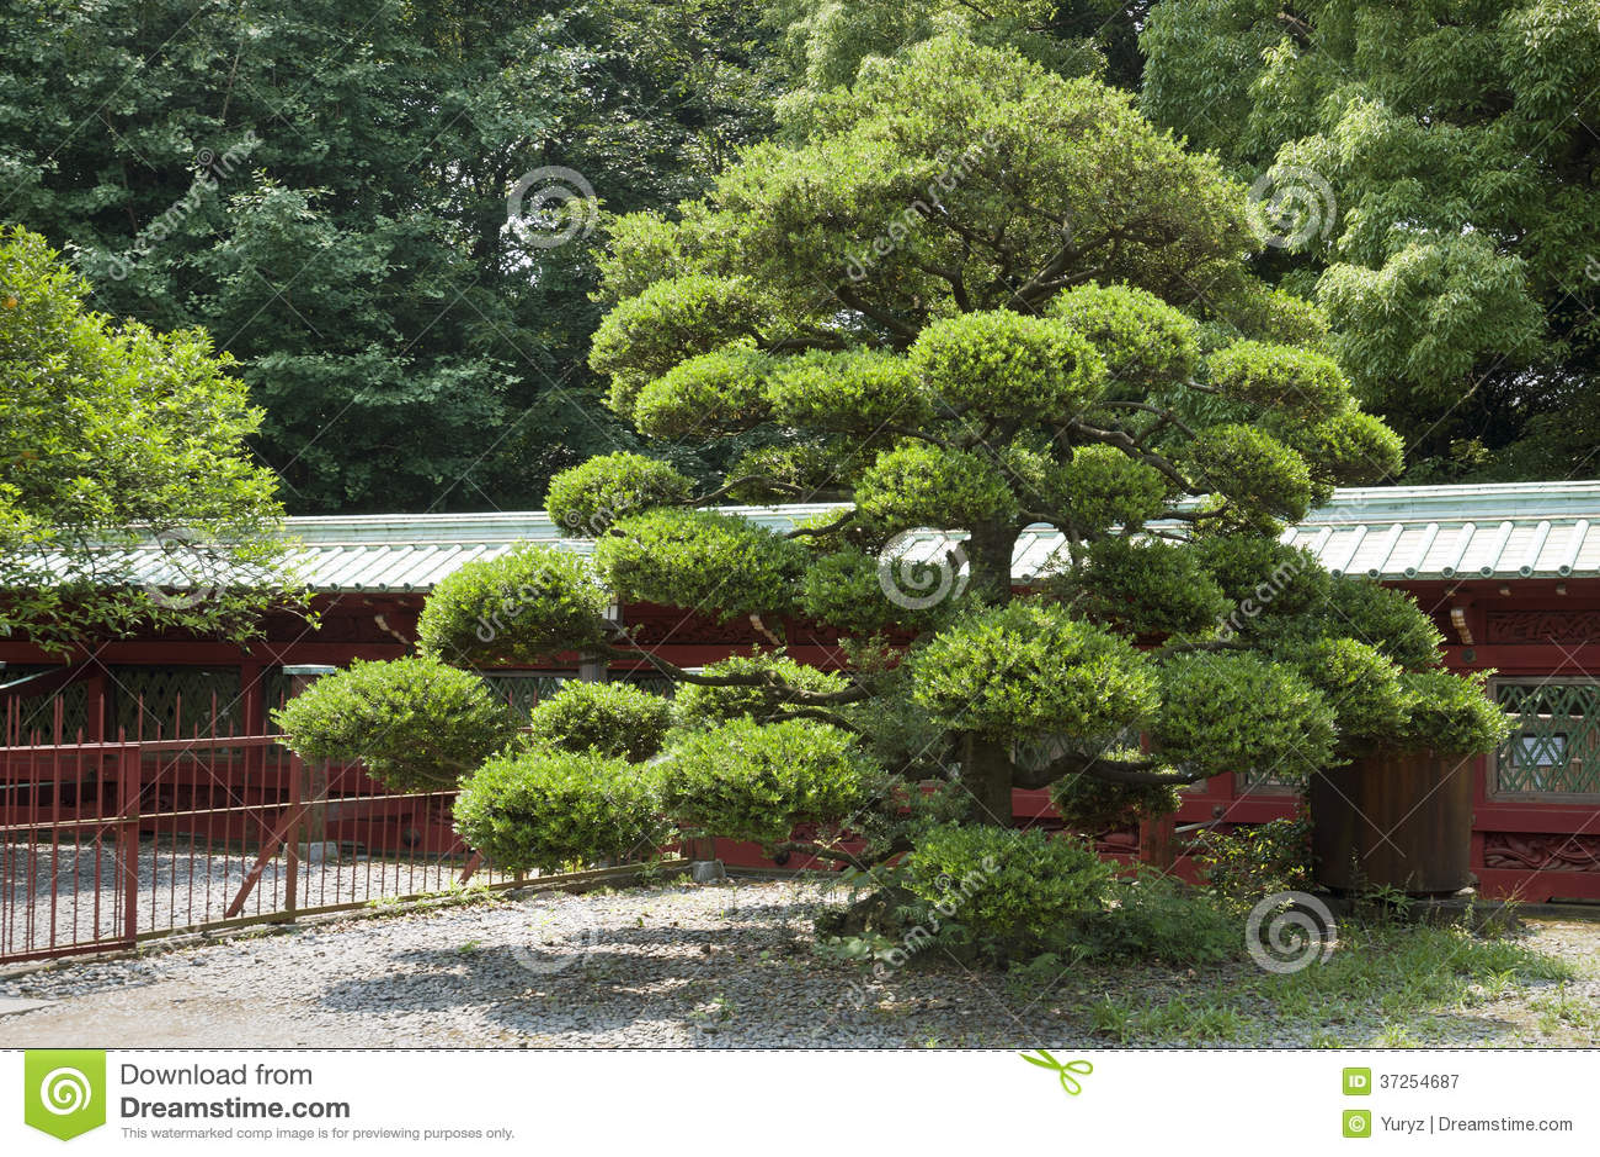 japanische kiefer stockbild bild von kiefer b gel nave 37254687. Black Bedroom Furniture Sets. Home Design Ideas